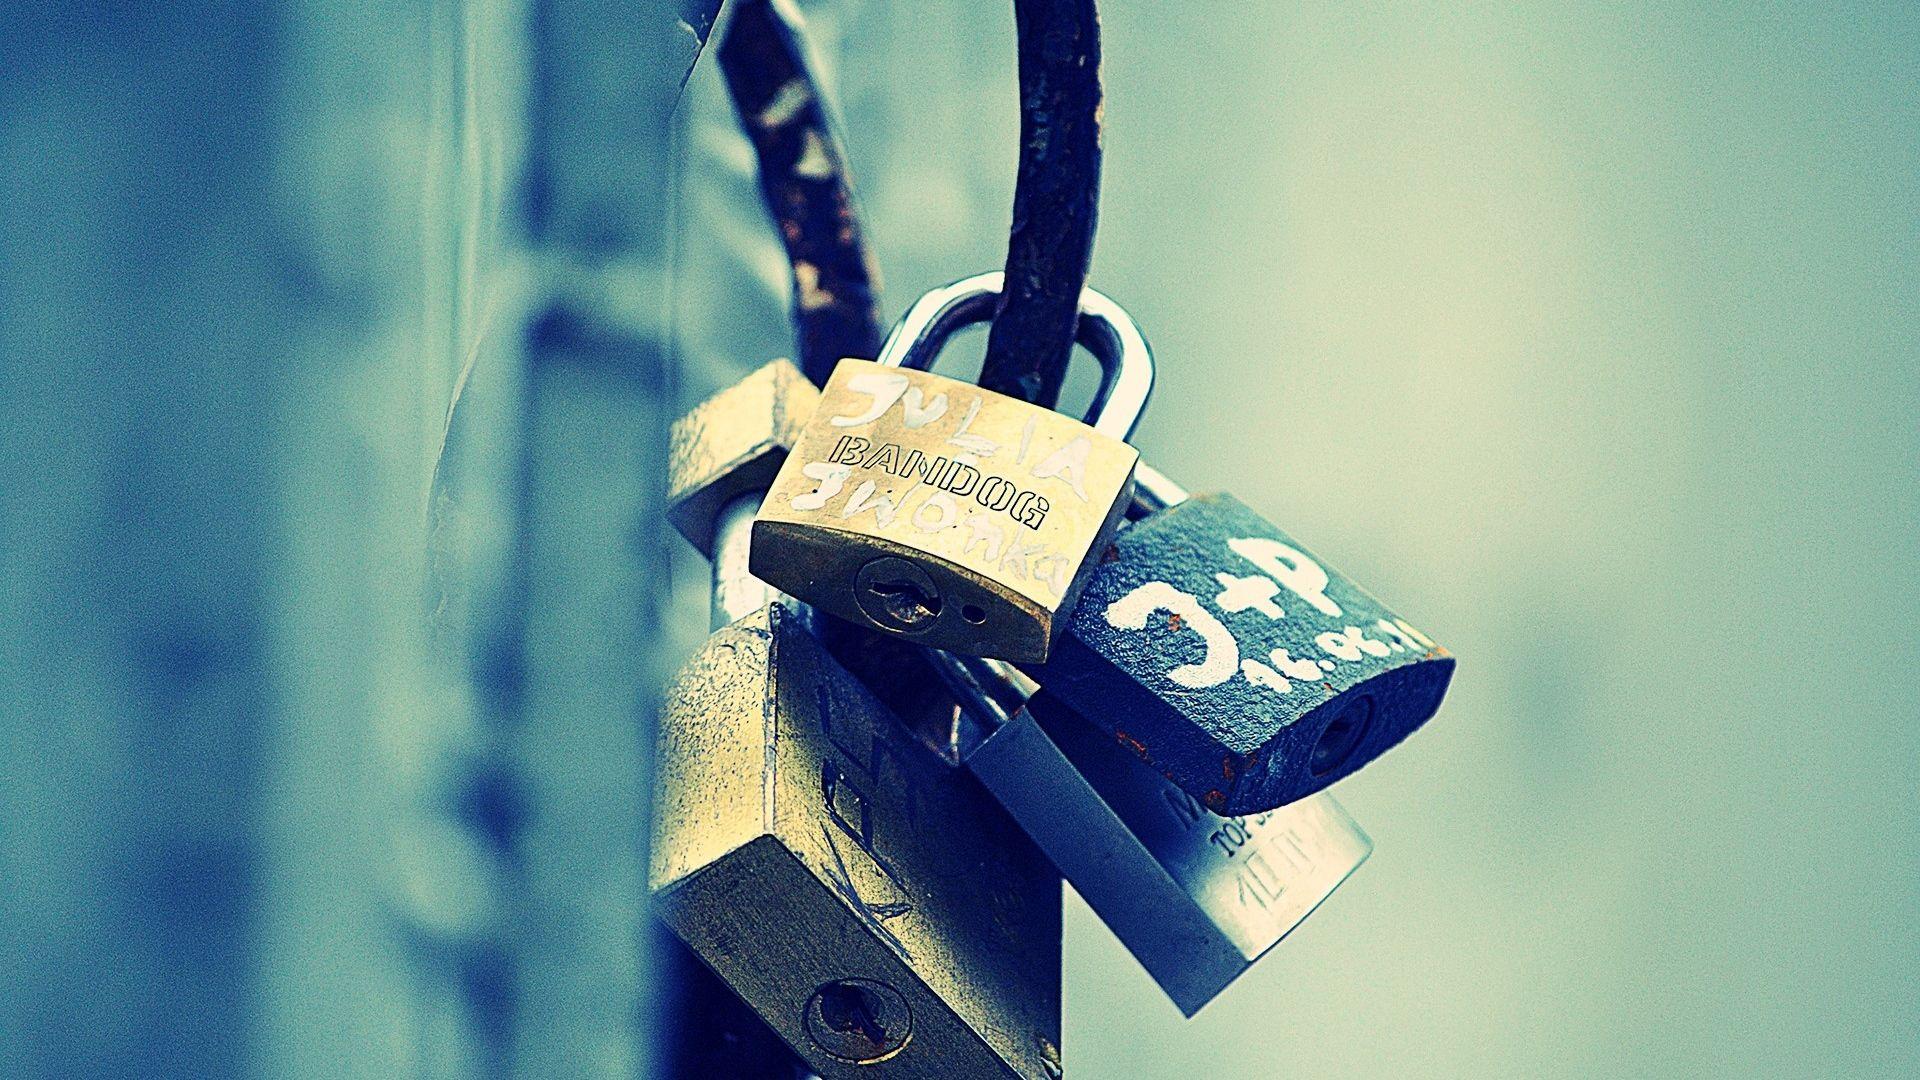 lock, bunch, metal - http://www.wallpapers4u.org/lock-bunch-metal/